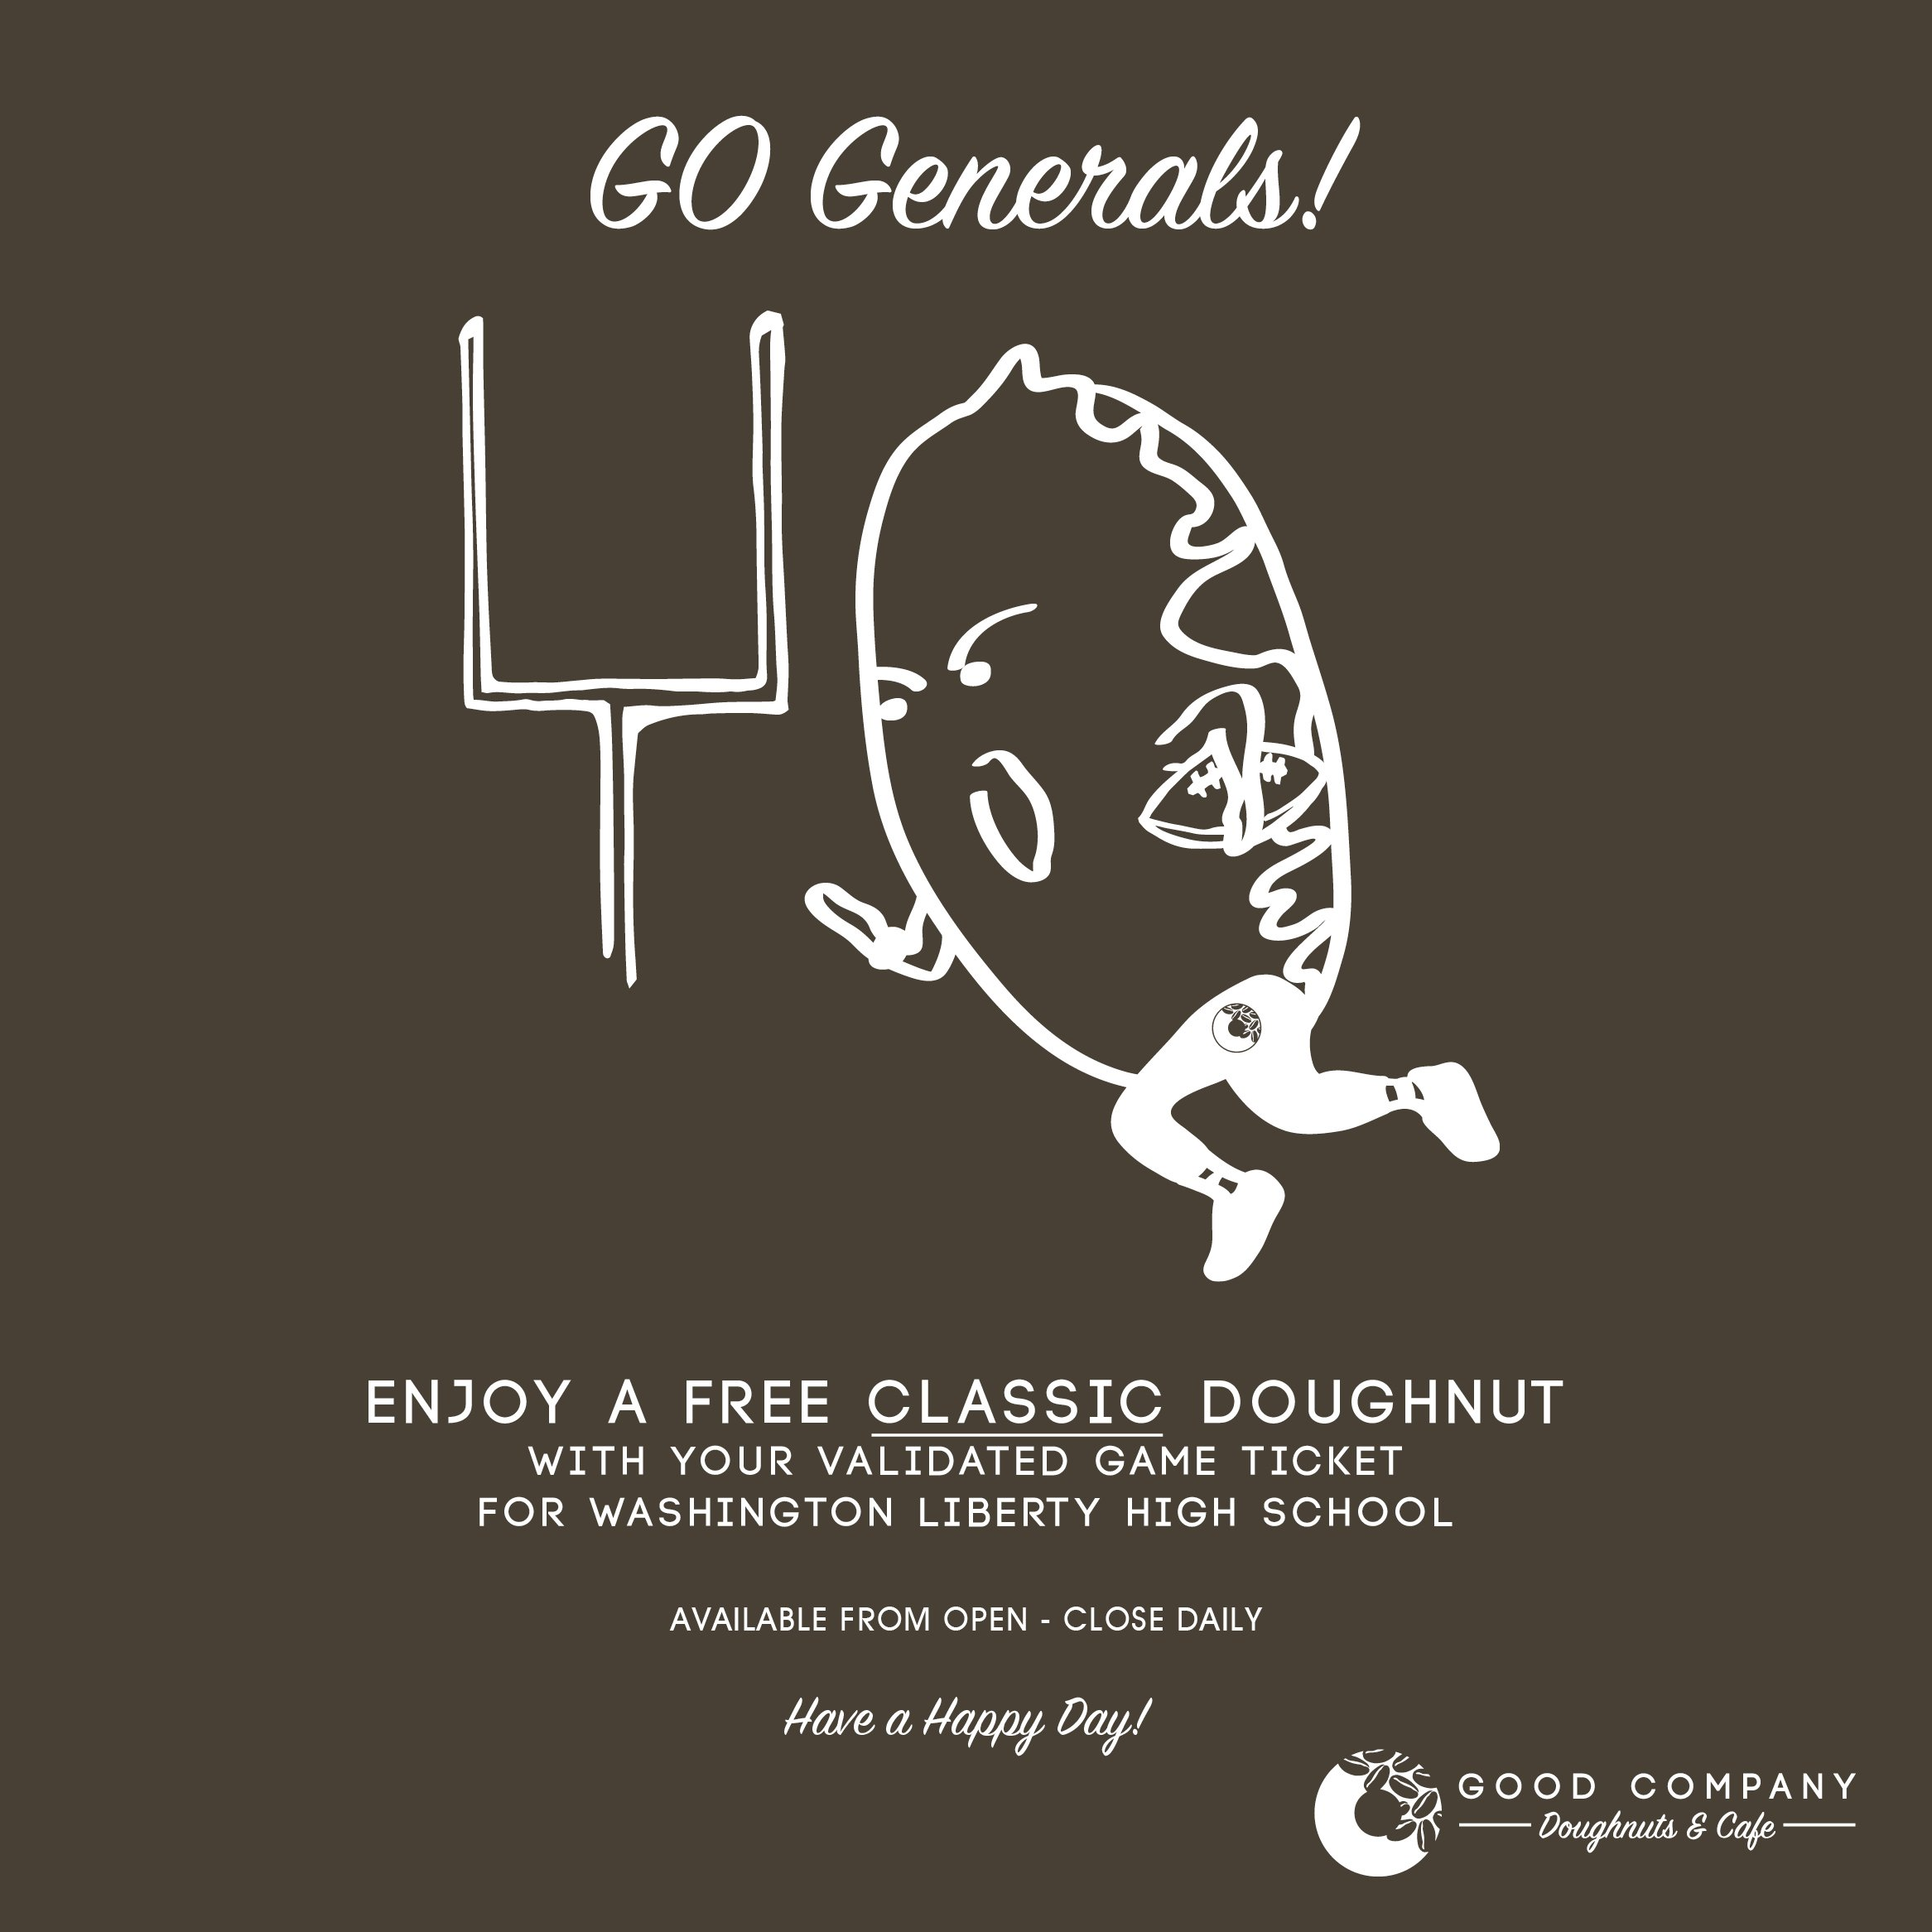 Go Generals!